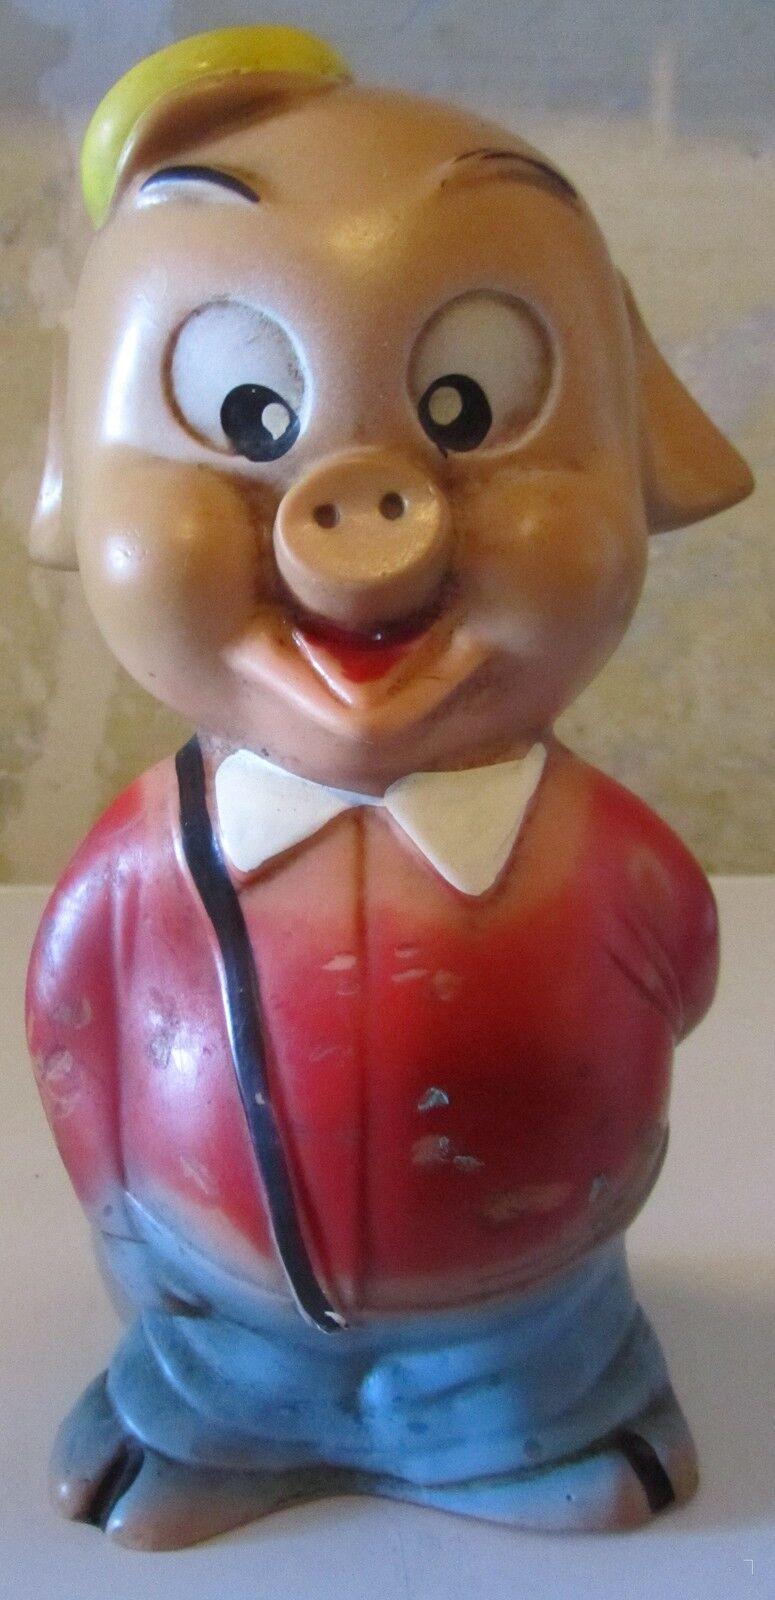 Porky Pig Pallino anni 70 Gomma Rubber toy SPESE GRATIS